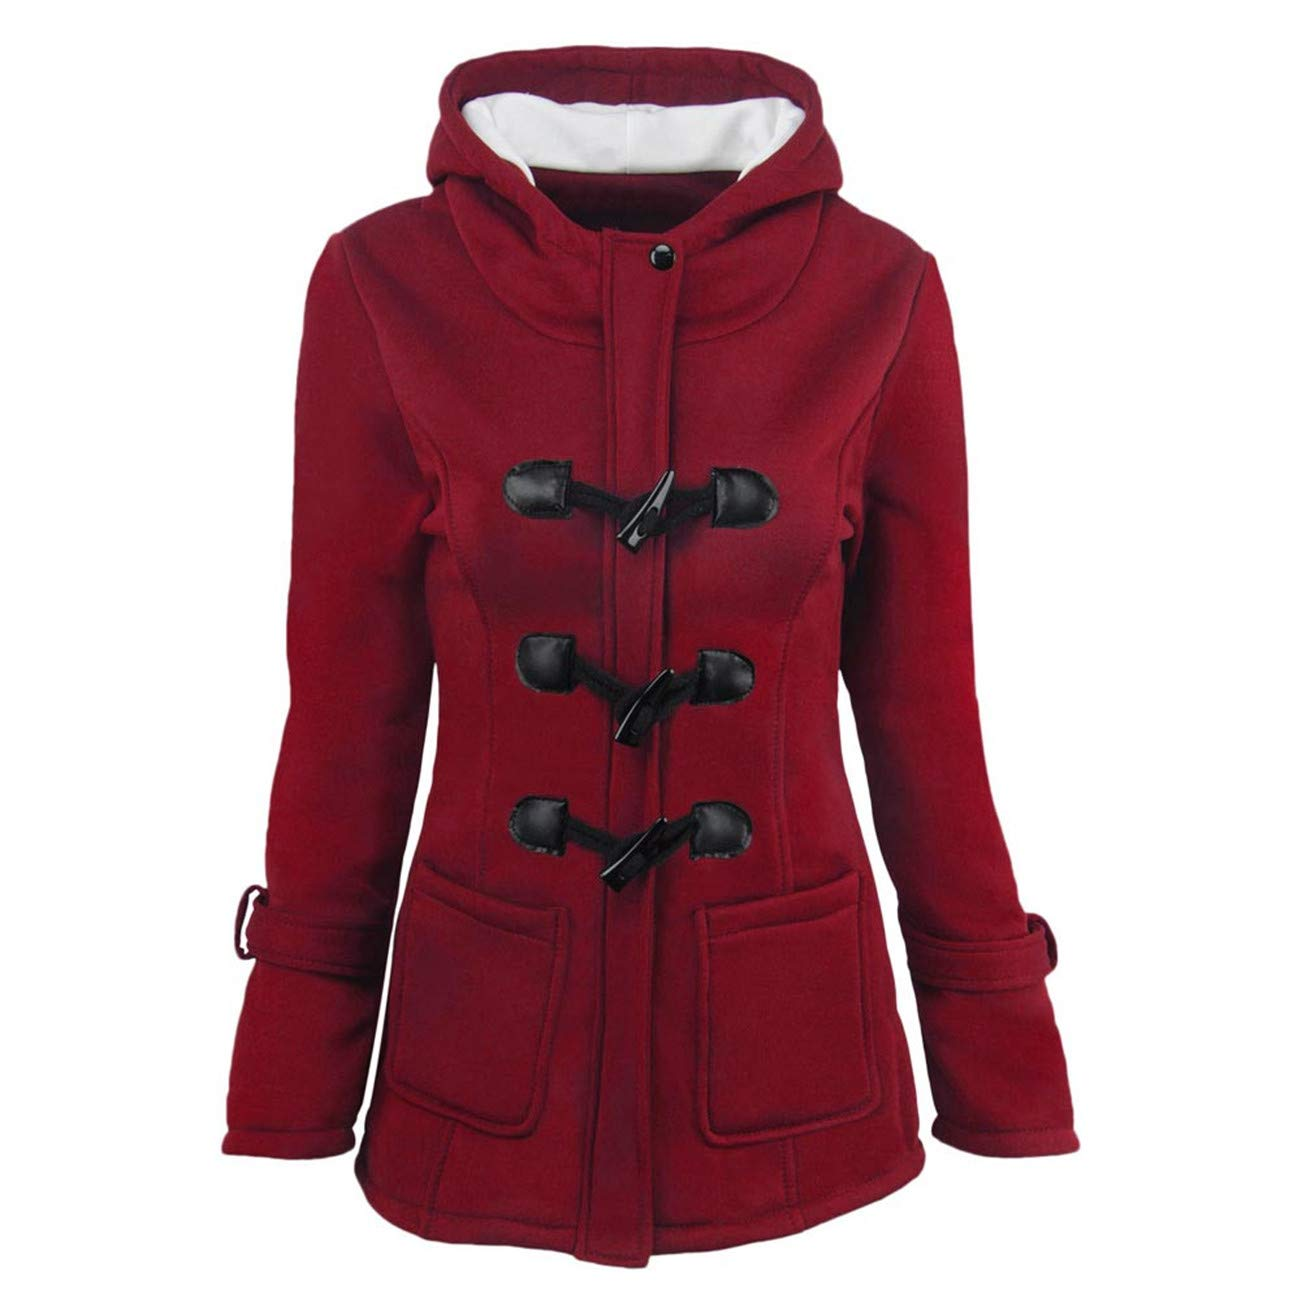 AMUSTER -Inverno Autunno Donna Elegante Cerimonia Fashion Casual Giacca A Vento in Lana Calda Slim Long Coat Jacket Trench